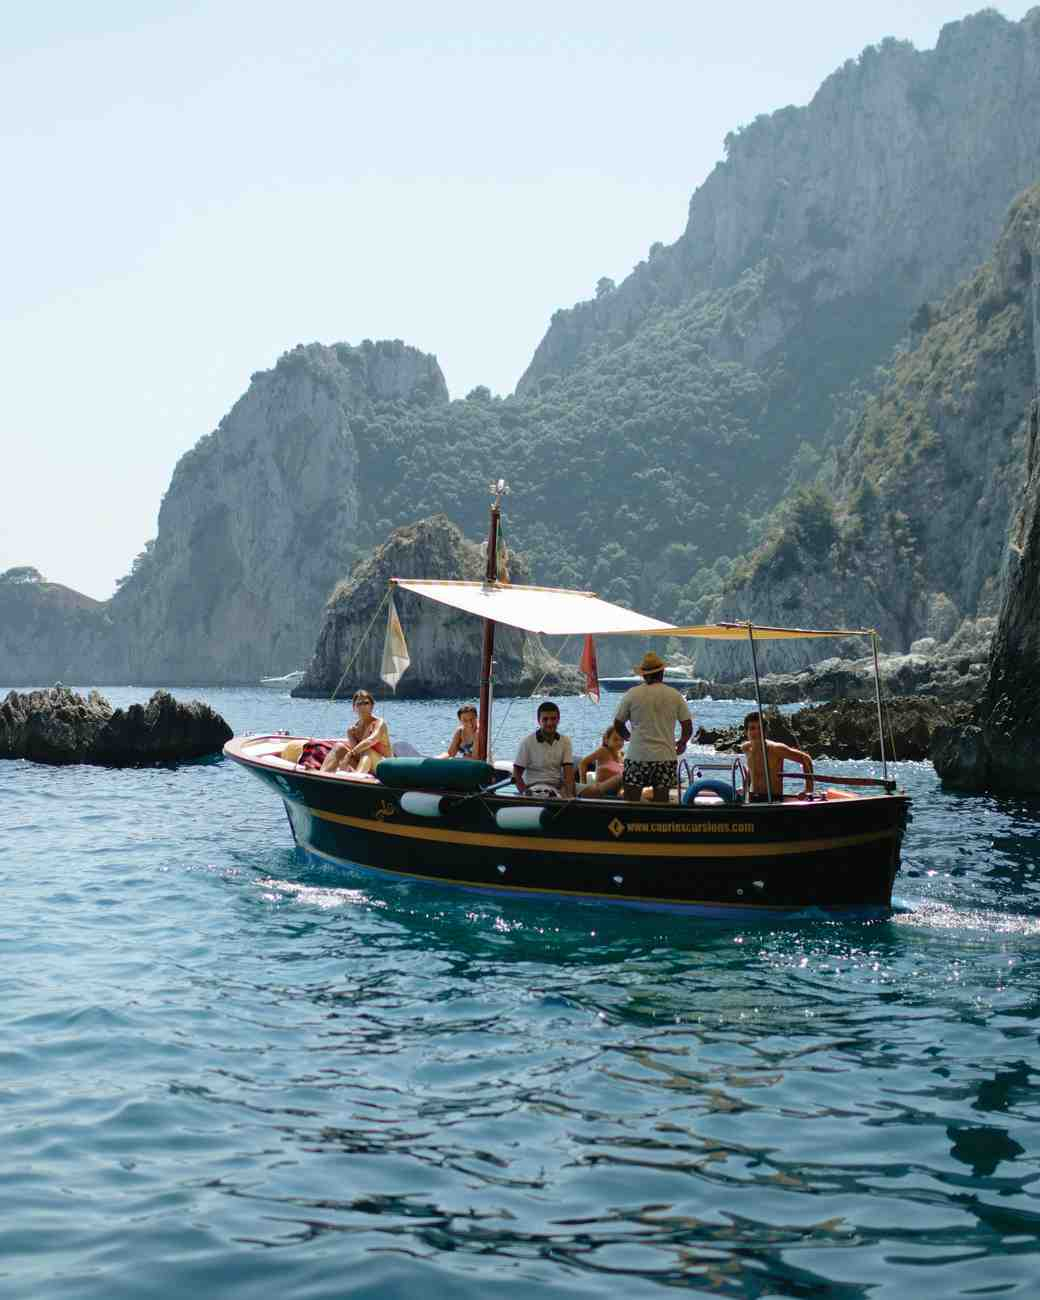 travel-honeymoon-diaries-capri-itlay-boat-ride-s112936.jpg